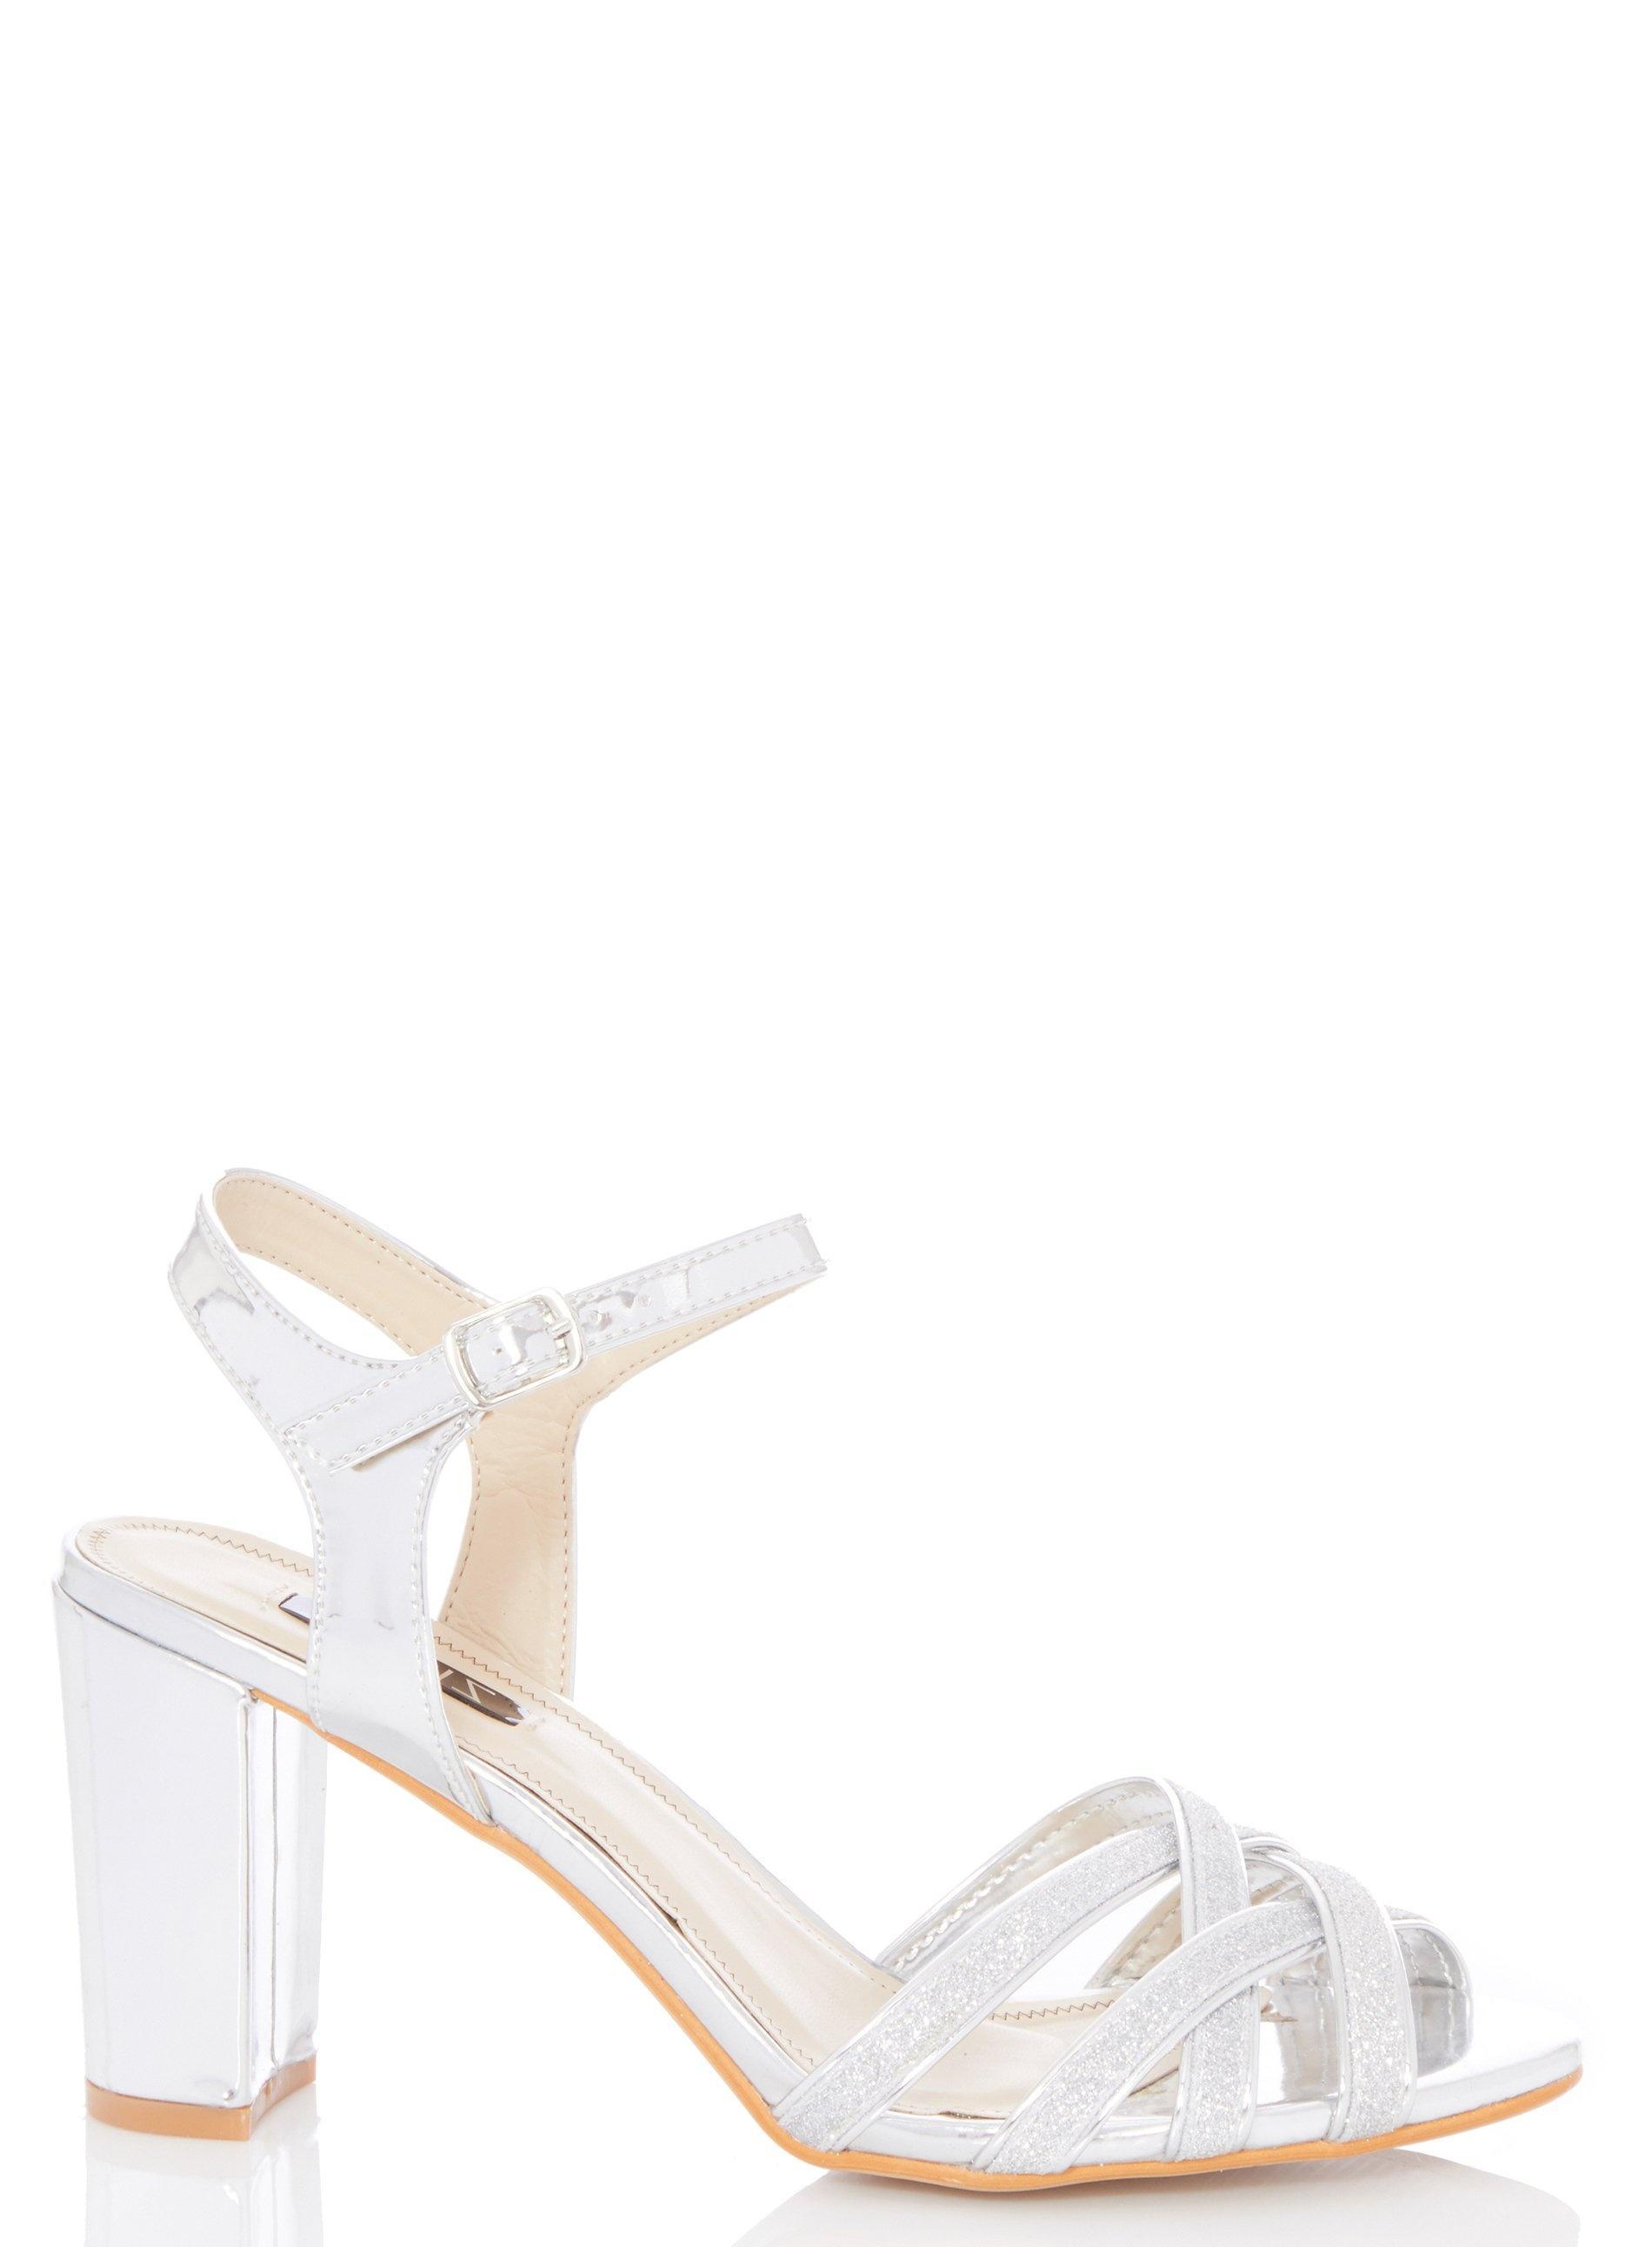 e68d3f54265 Dorothy Perkins Quiz Glitter Block Heel Sandals in Metallic - Lyst